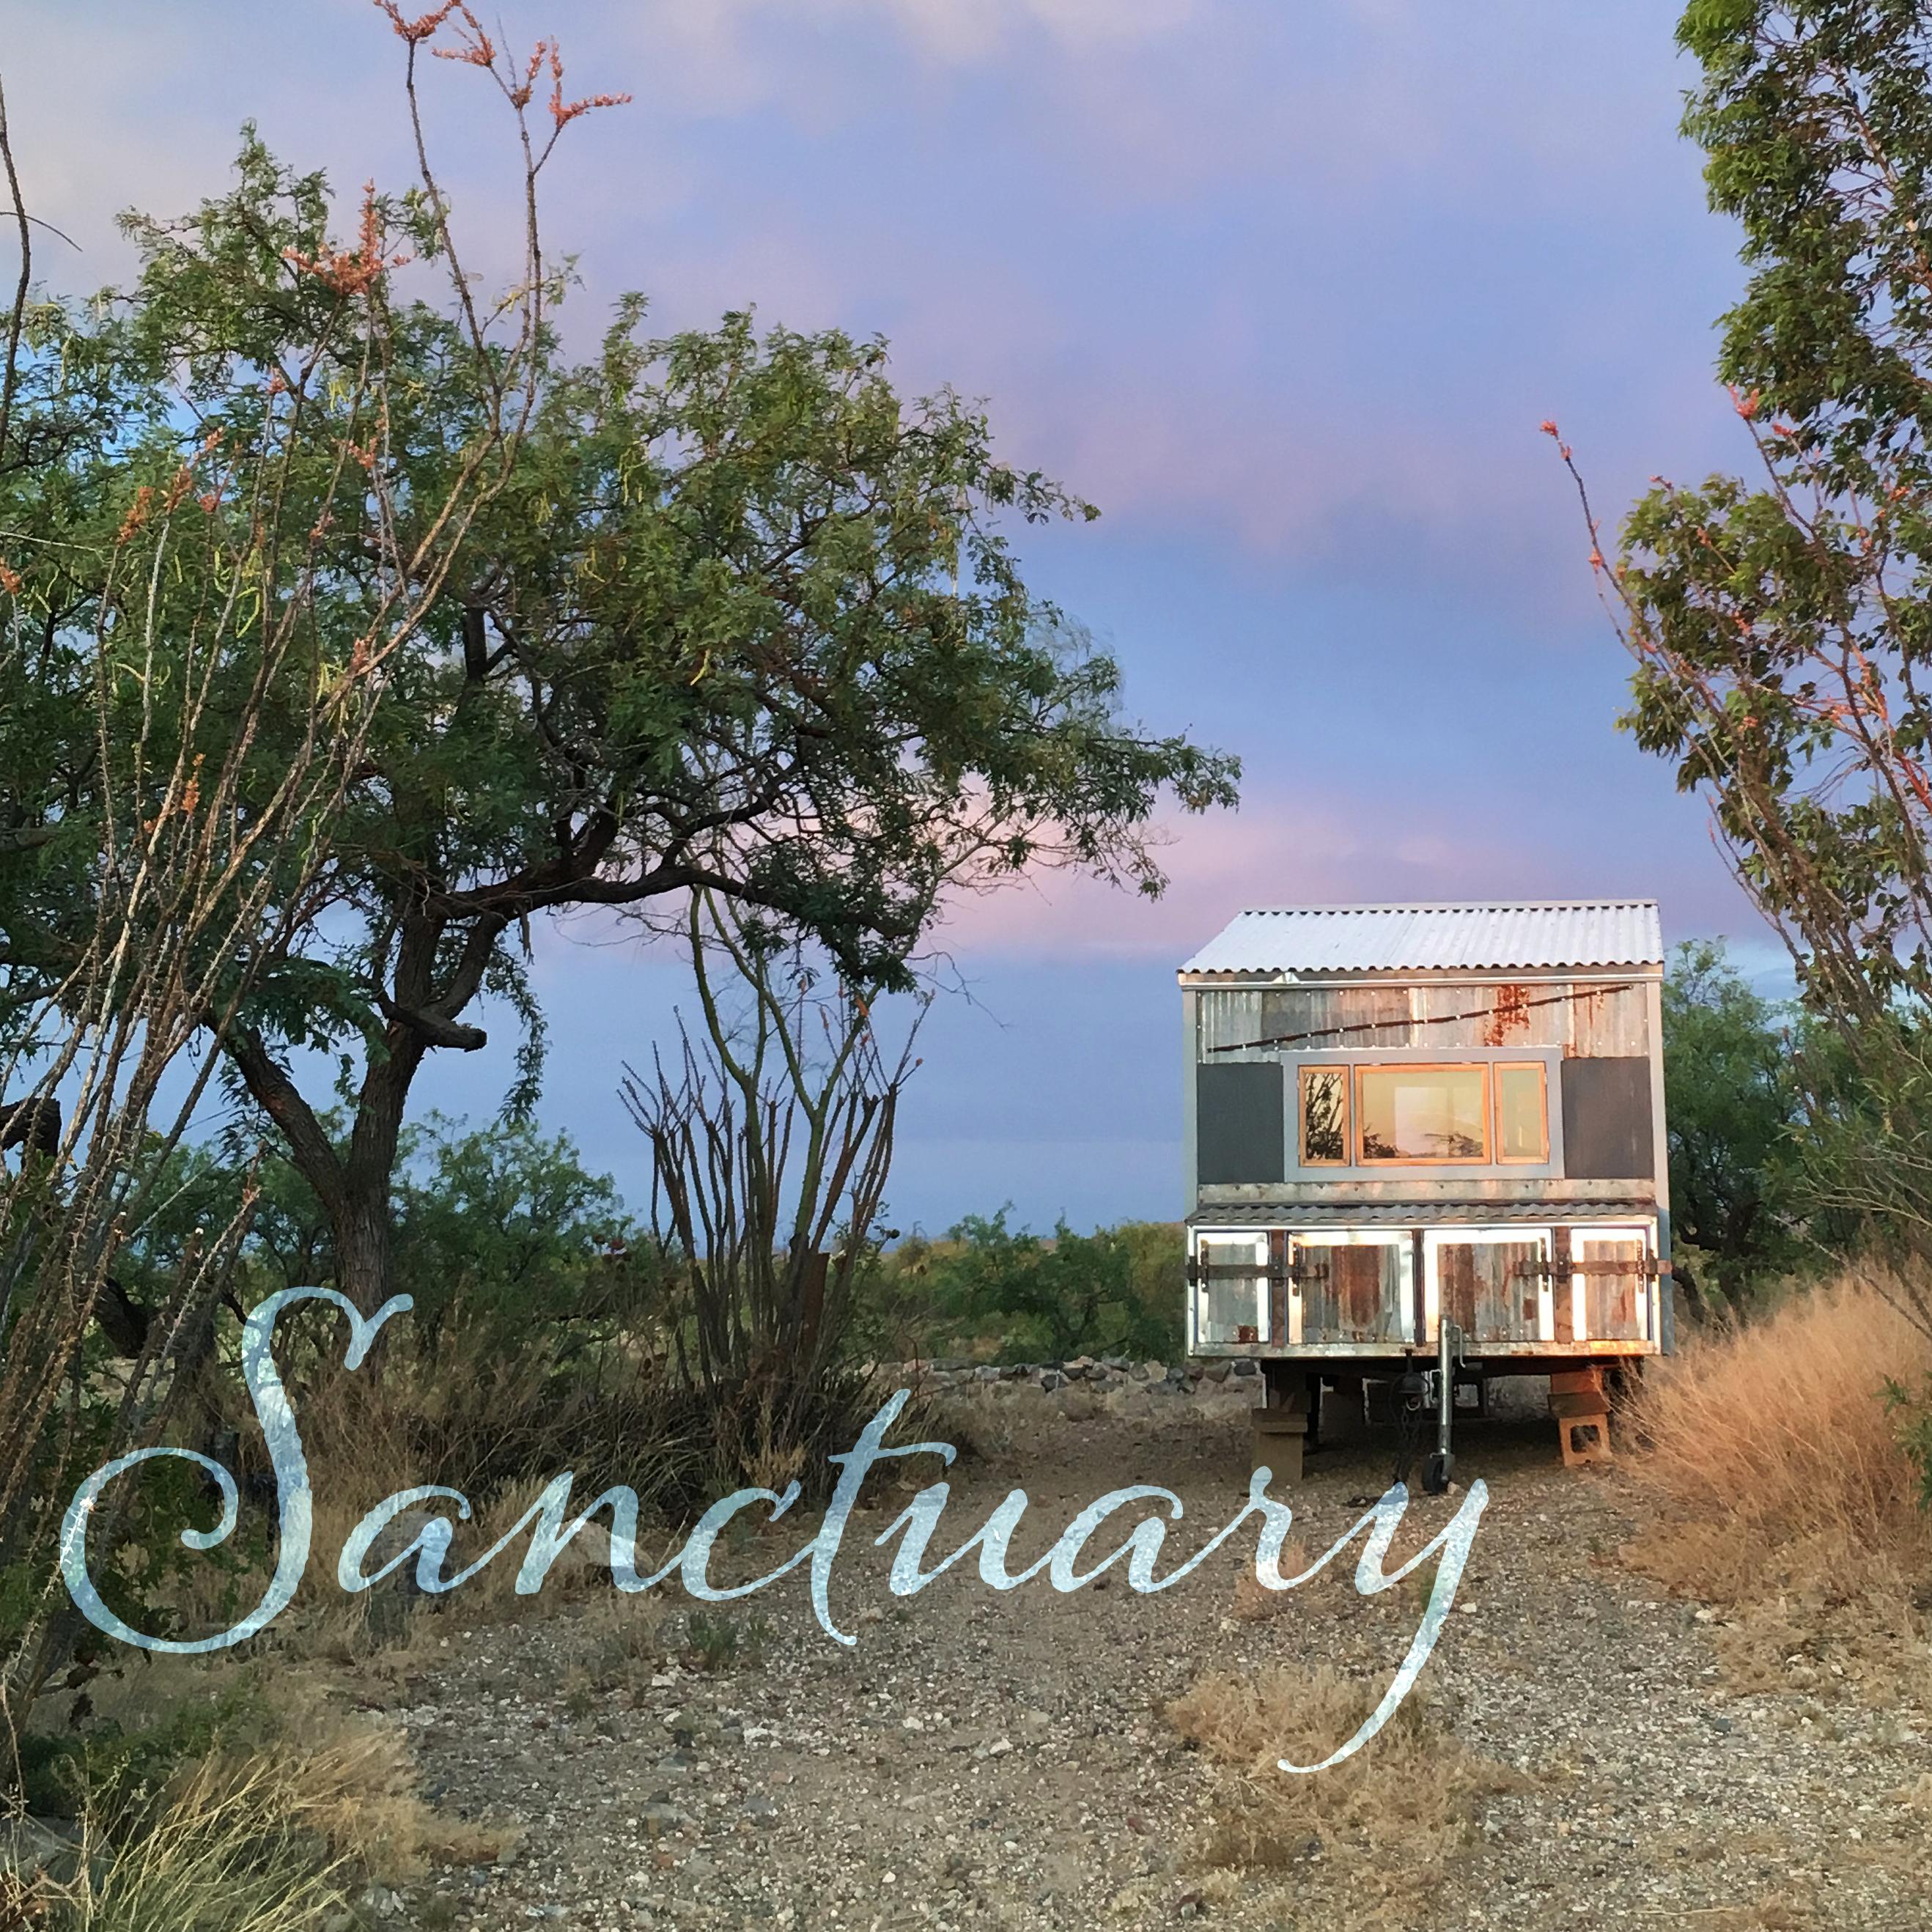 Fluent Self June - the month of Sanctuary